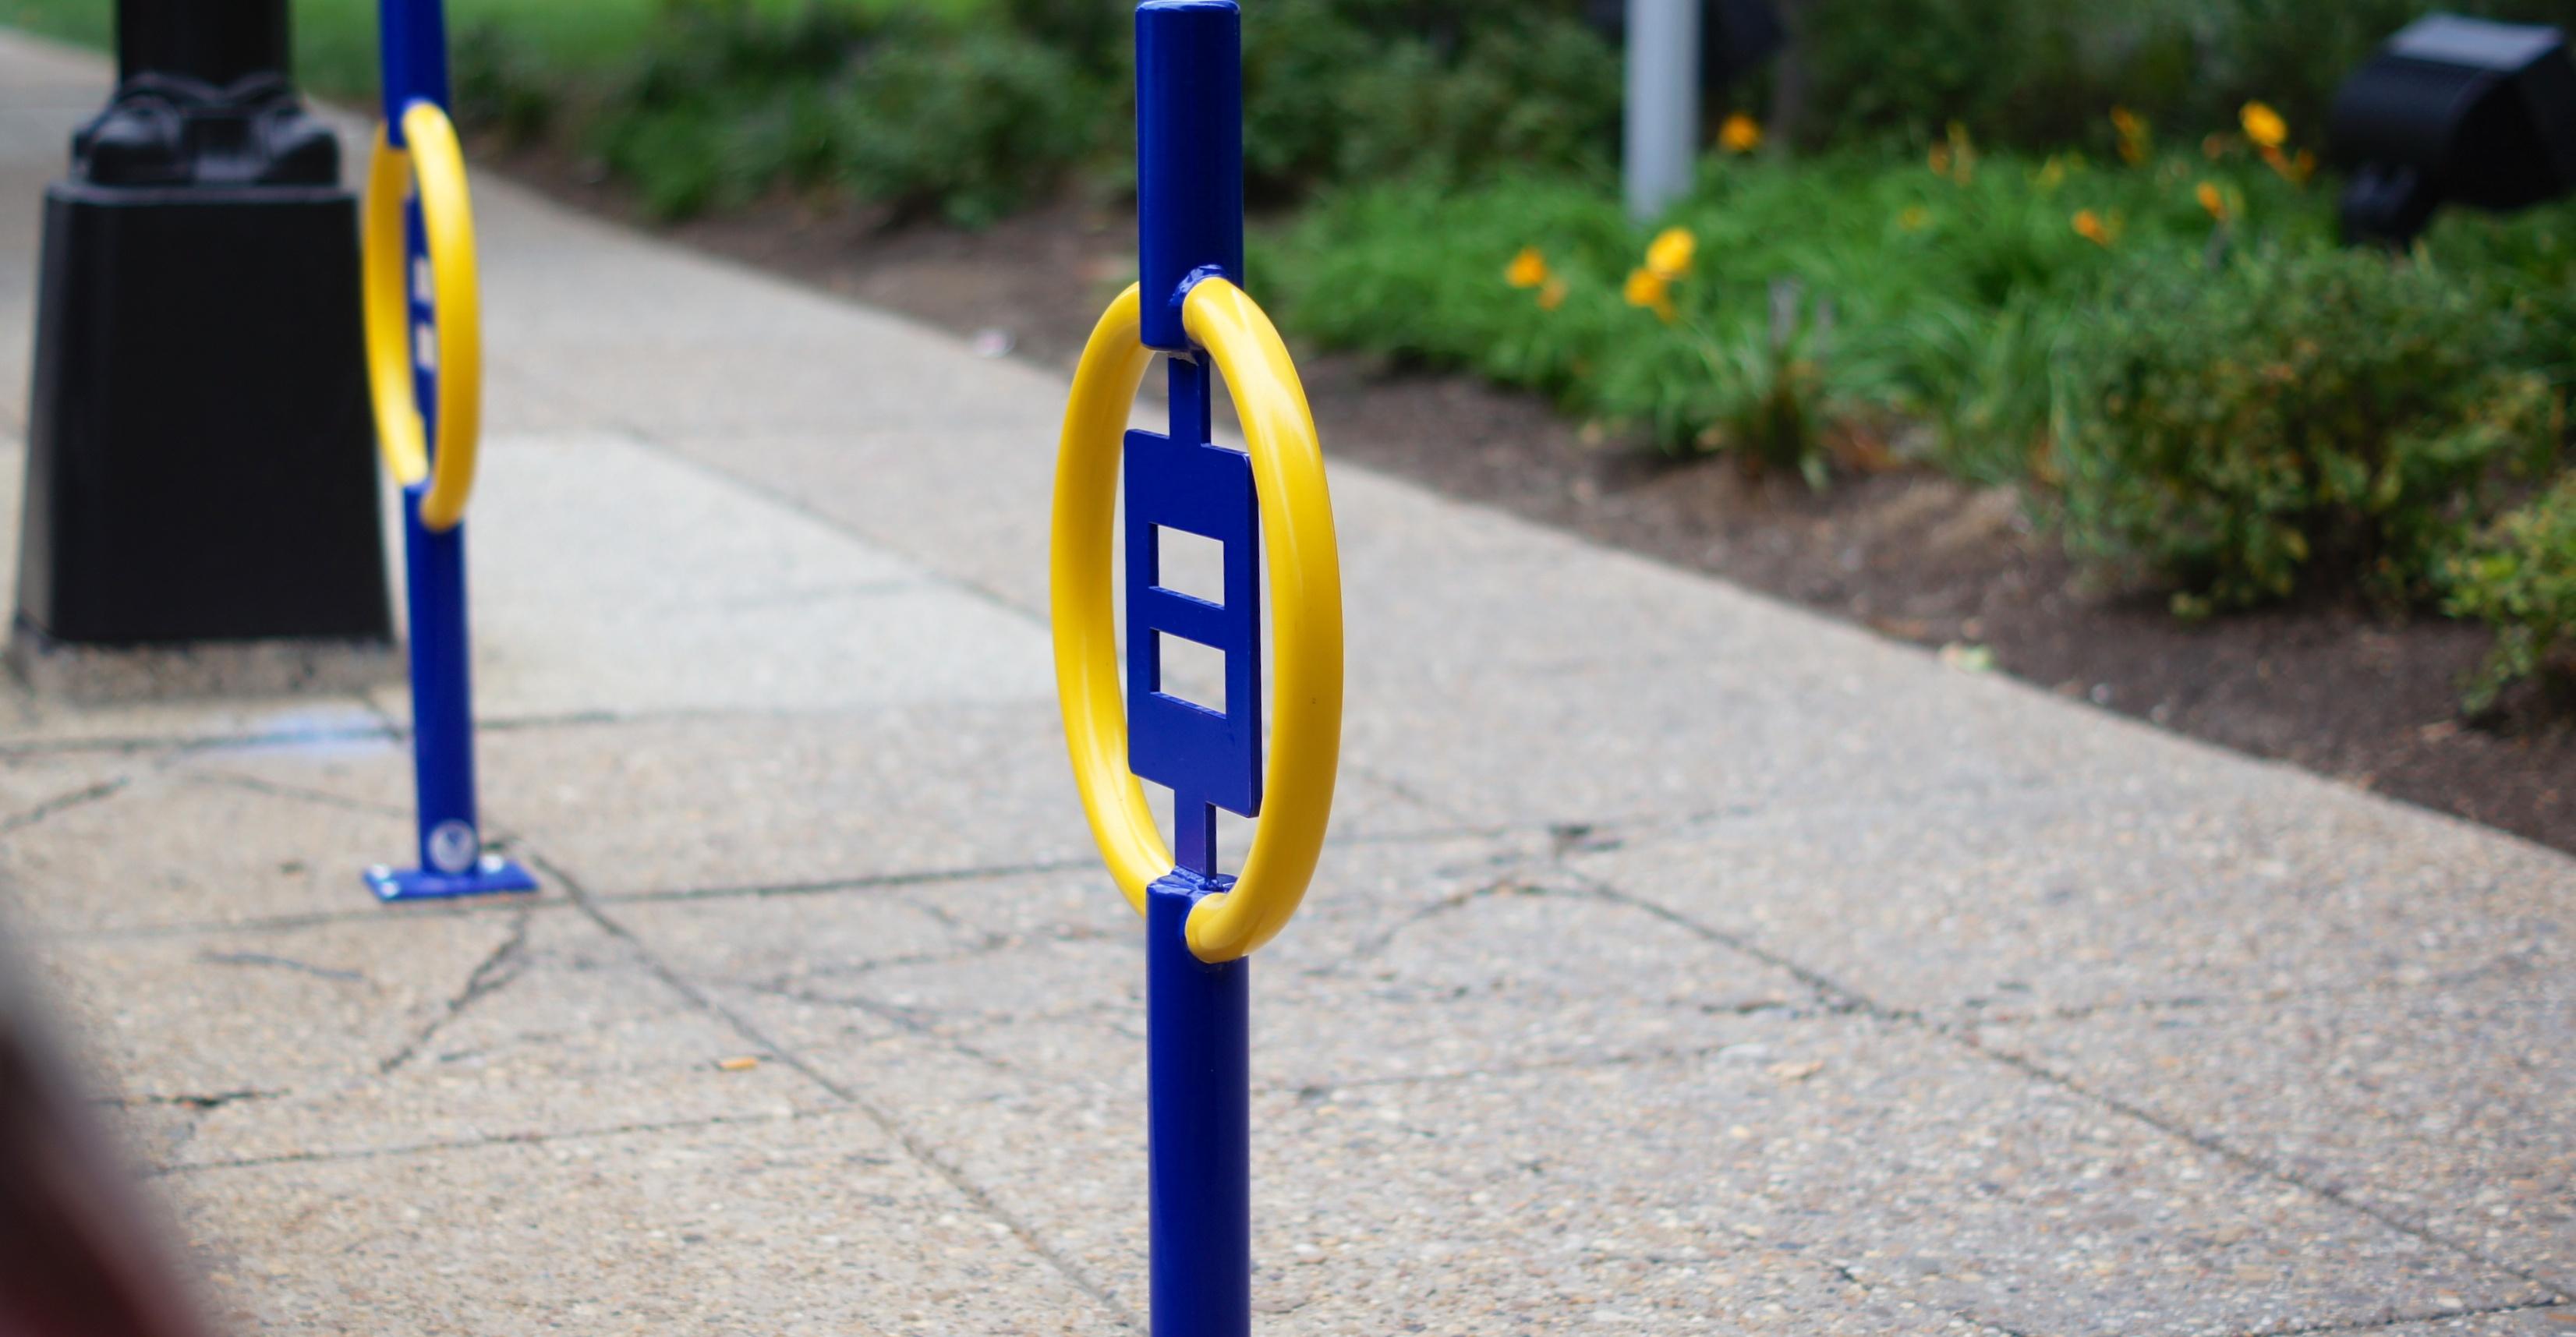 Equality Bike Rack - HRC 15118